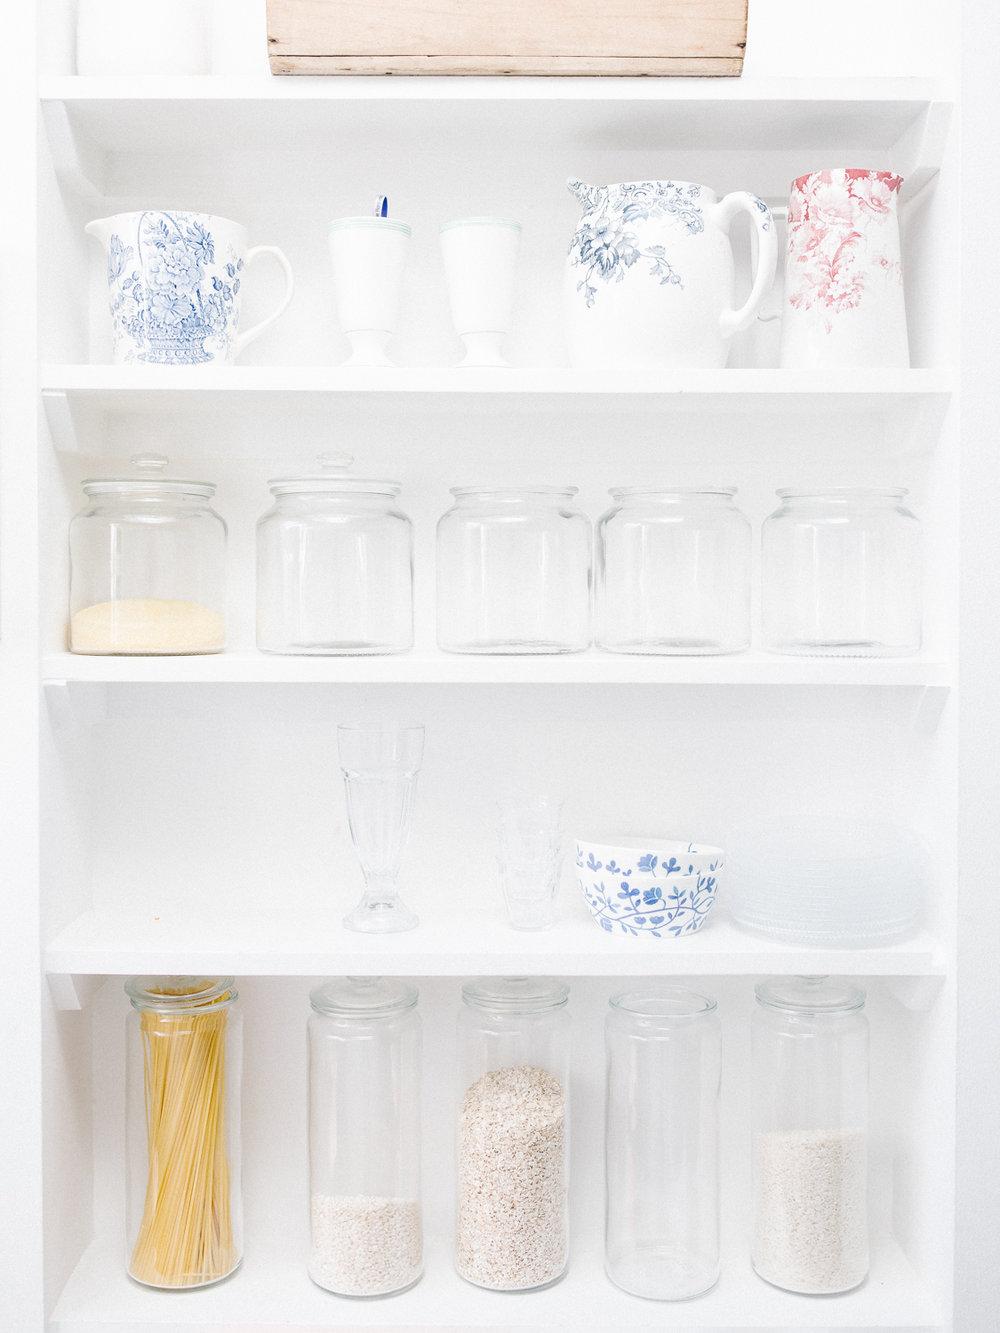 kitchen objects - Larkhall Place, Bath